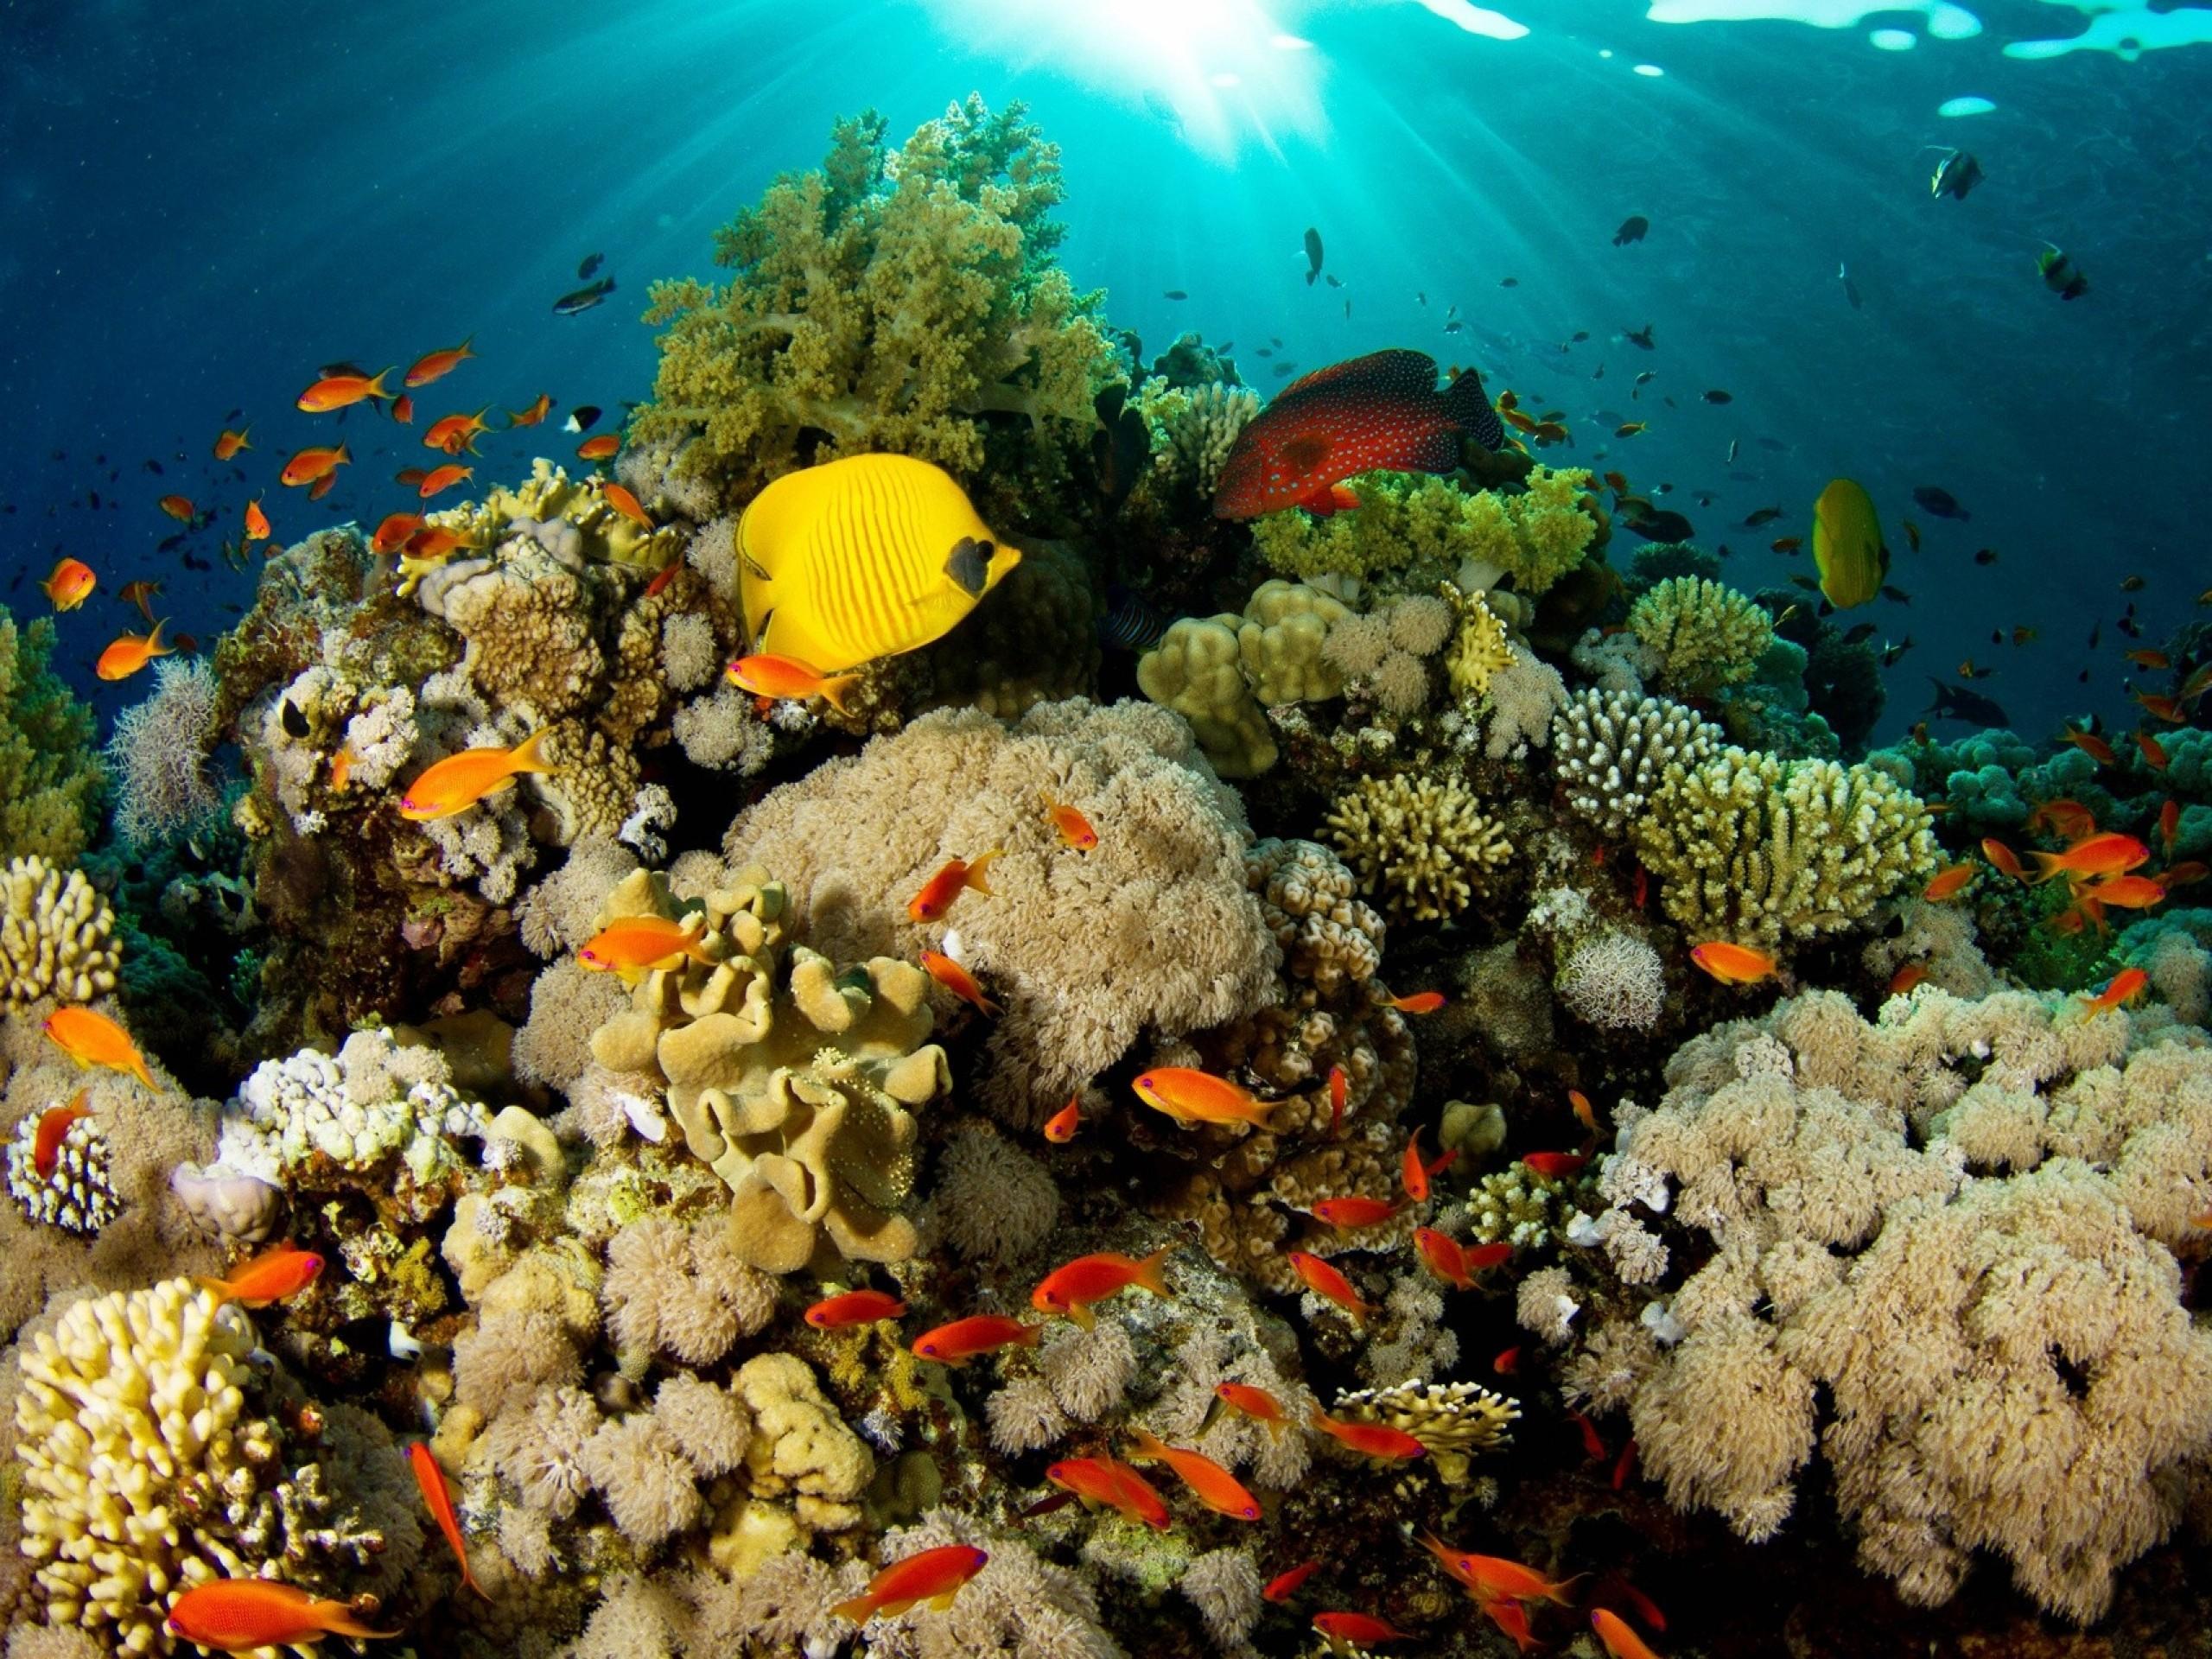 Peces tropicales – paisaje natural